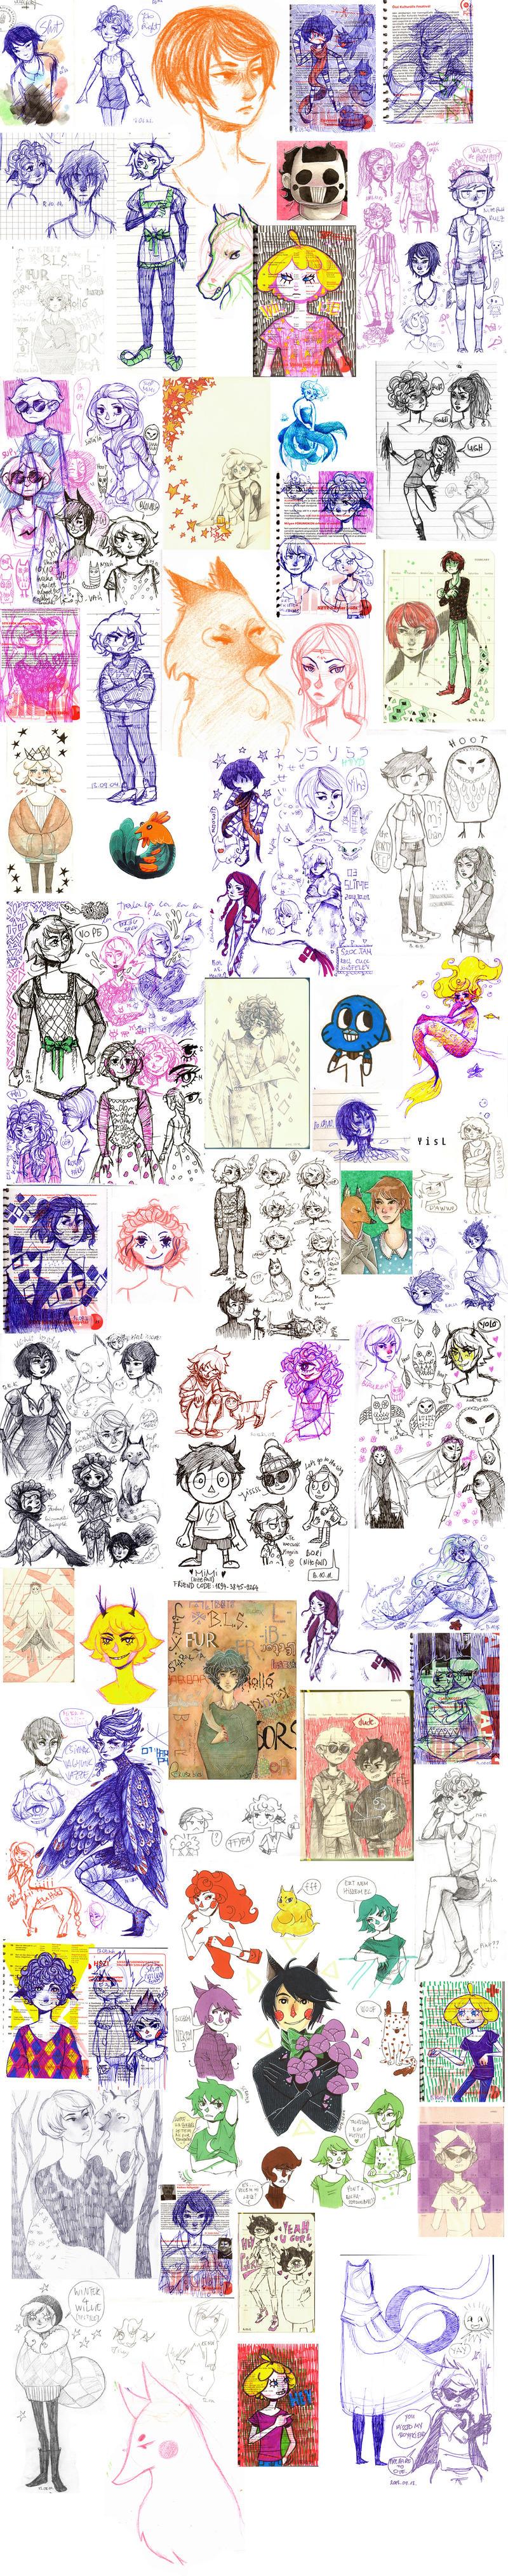 Sketchdump8-10 by maxyvert